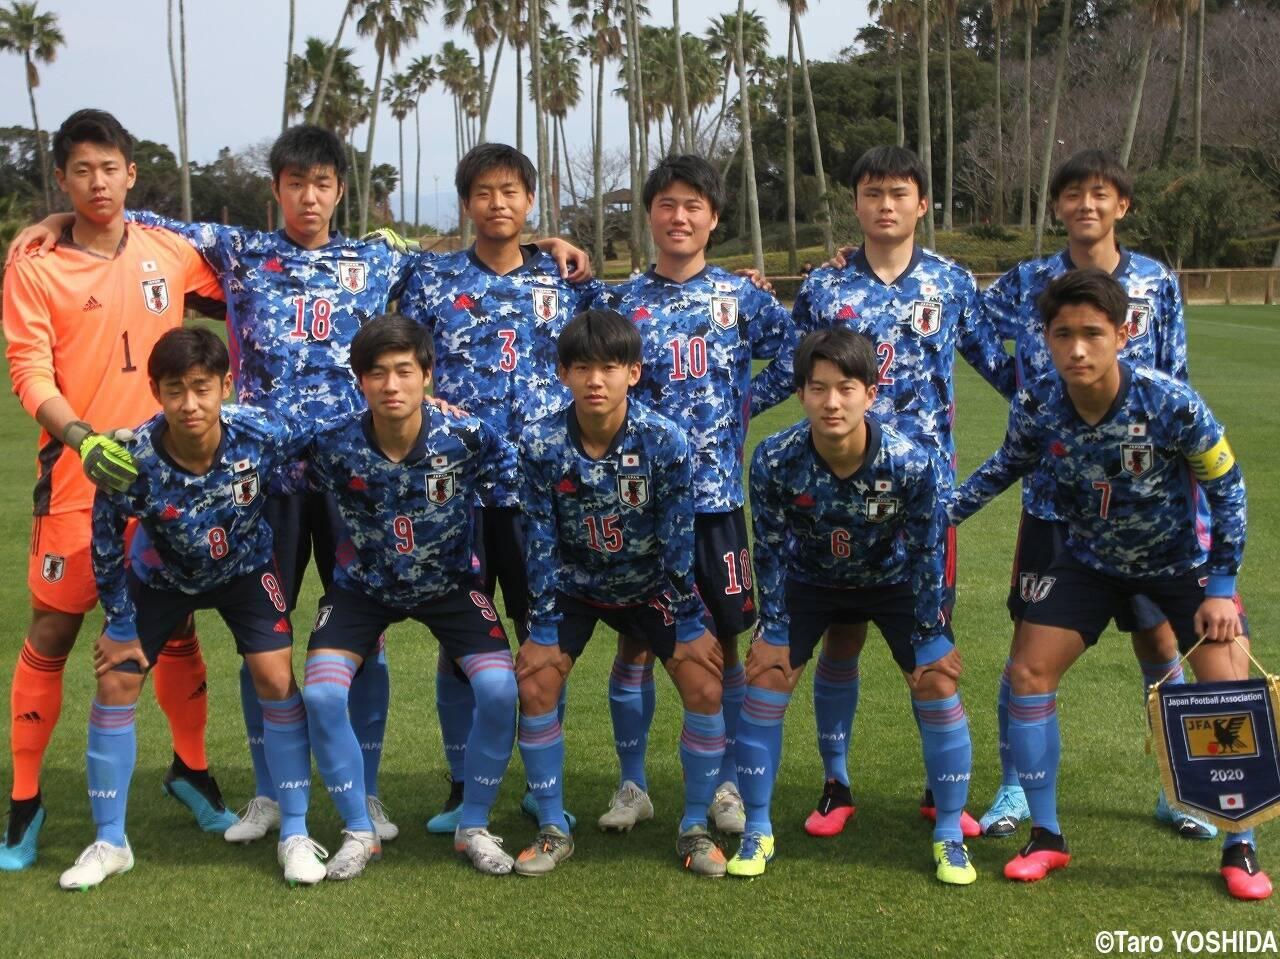 U-17日本代表がマレーシアを1-0撃破!決勝で東ティモールと対戦へ(19枚 ...